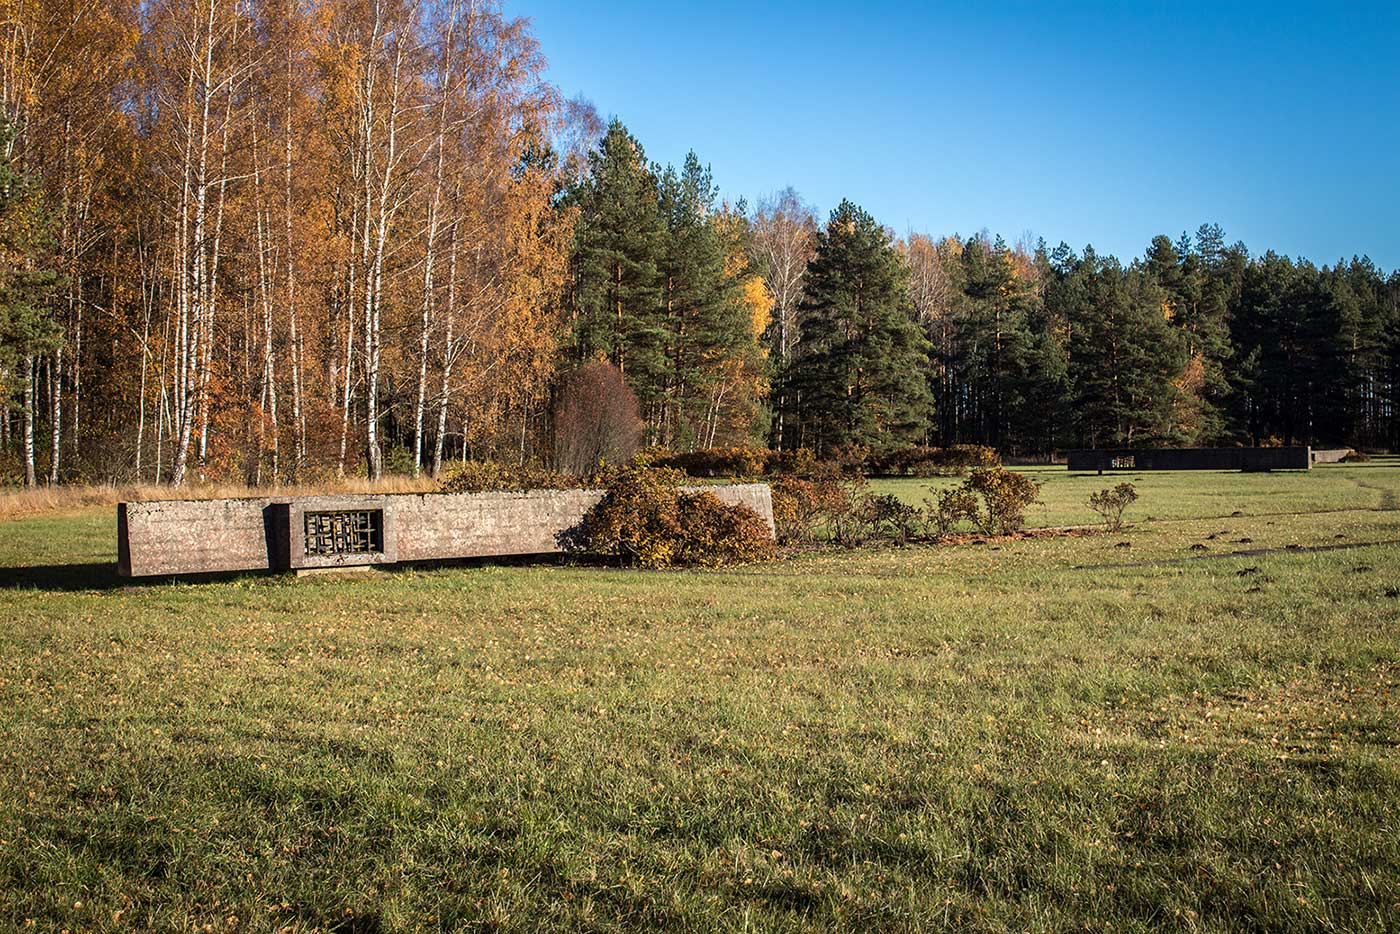 Fragments of the original barrack walls. Salaspils Memorial, Latvia.